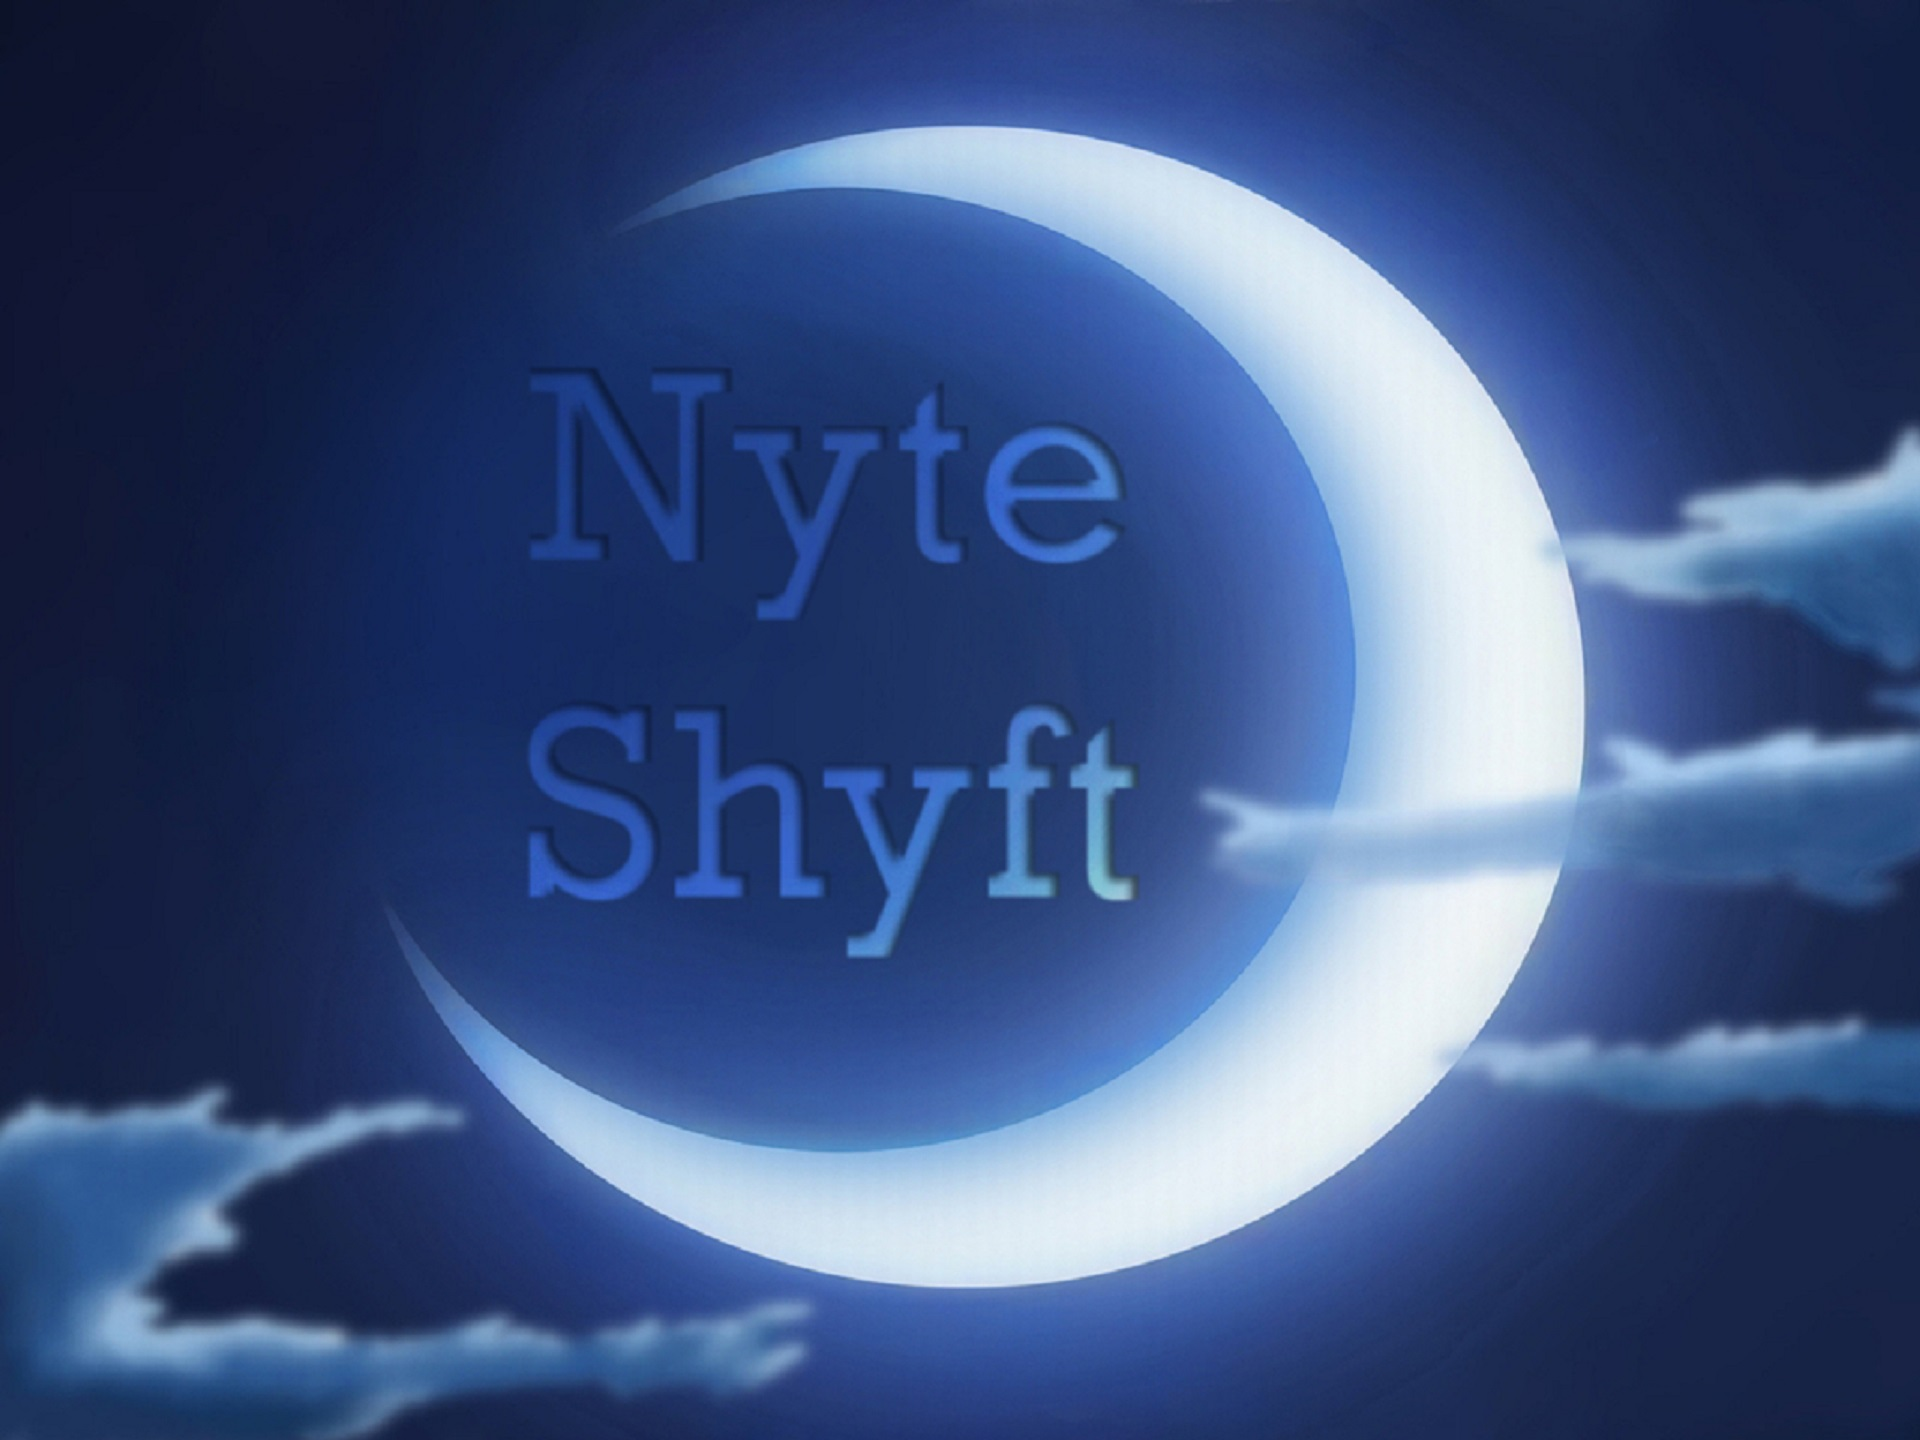 NyteShyft Band Store